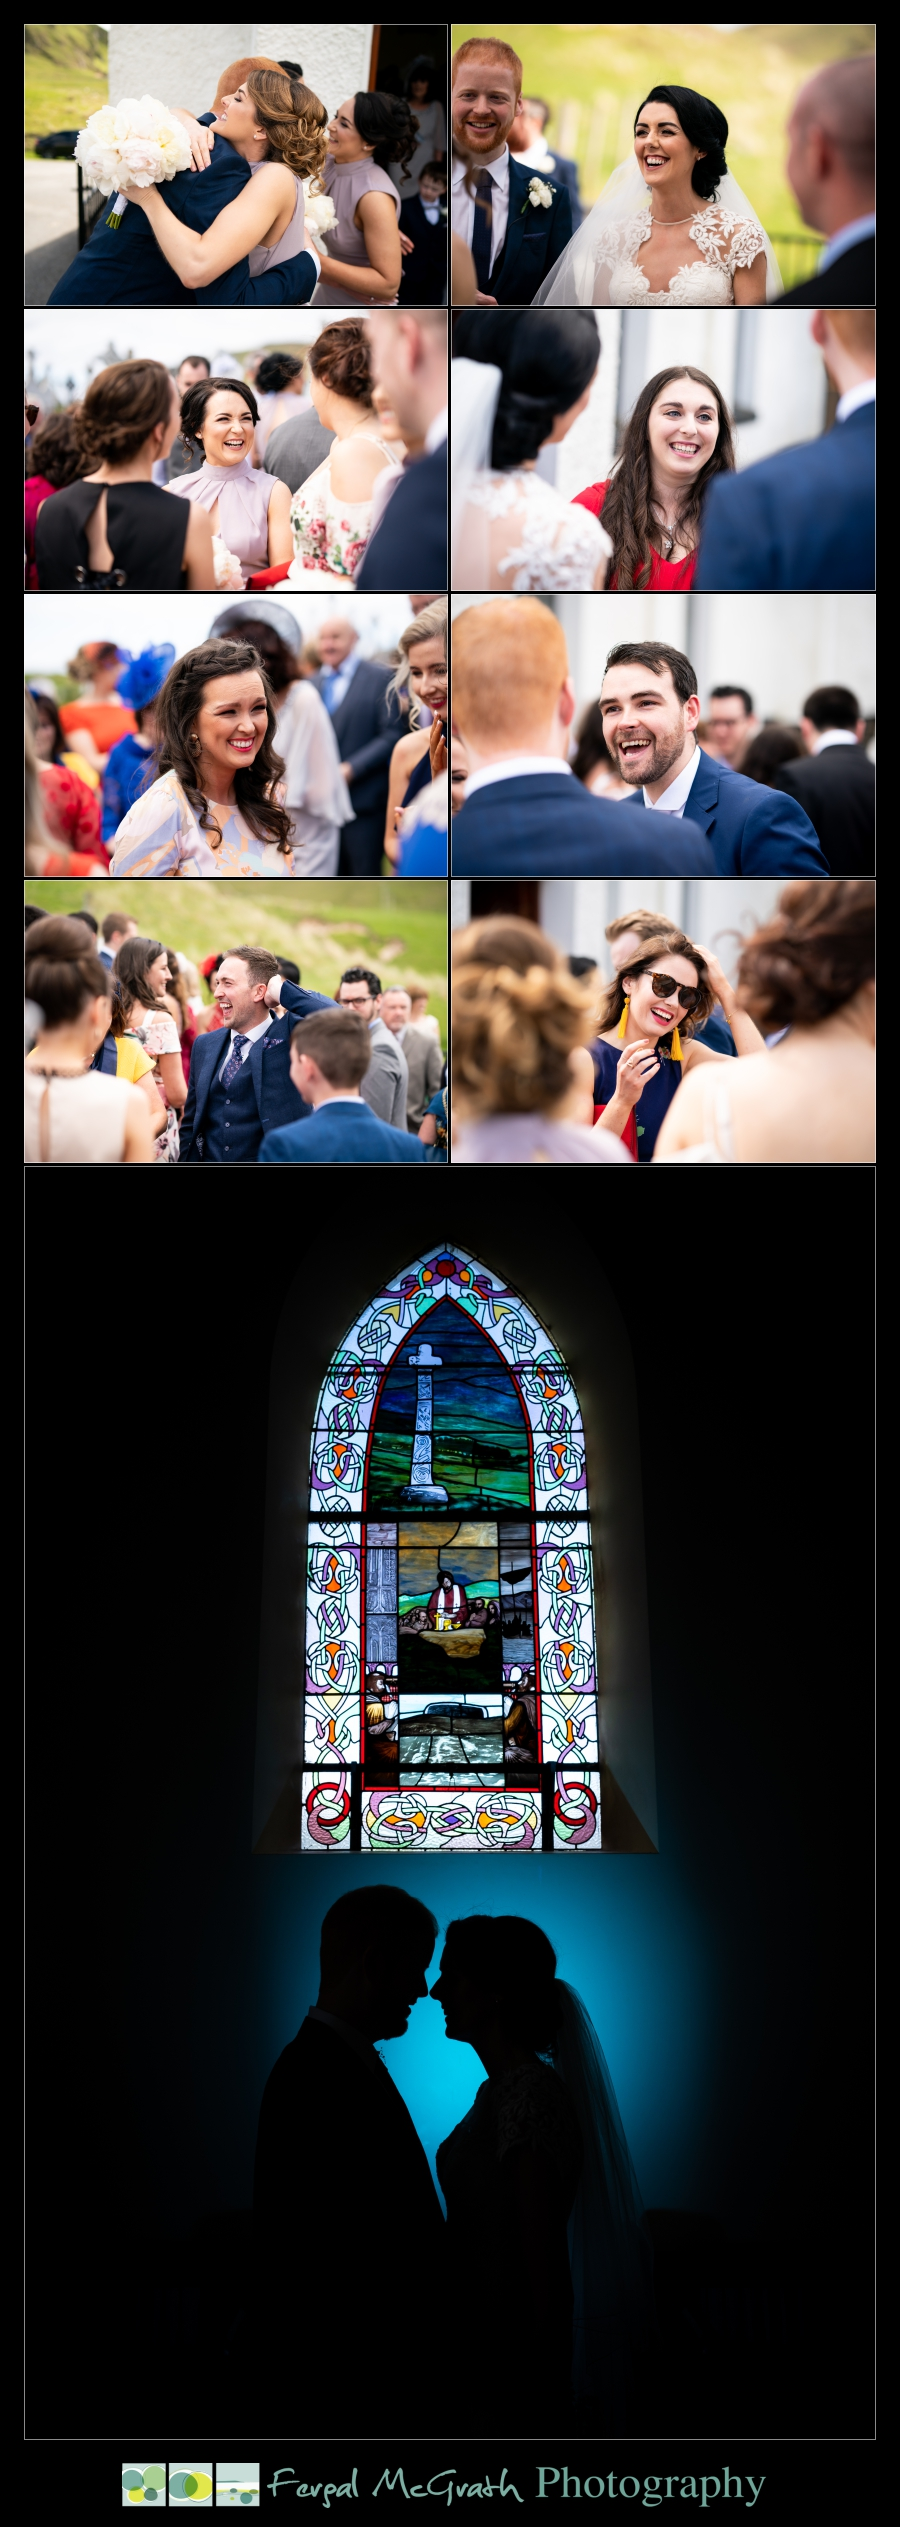 Ballyliffin Lodge Hotel Weddings guest photos